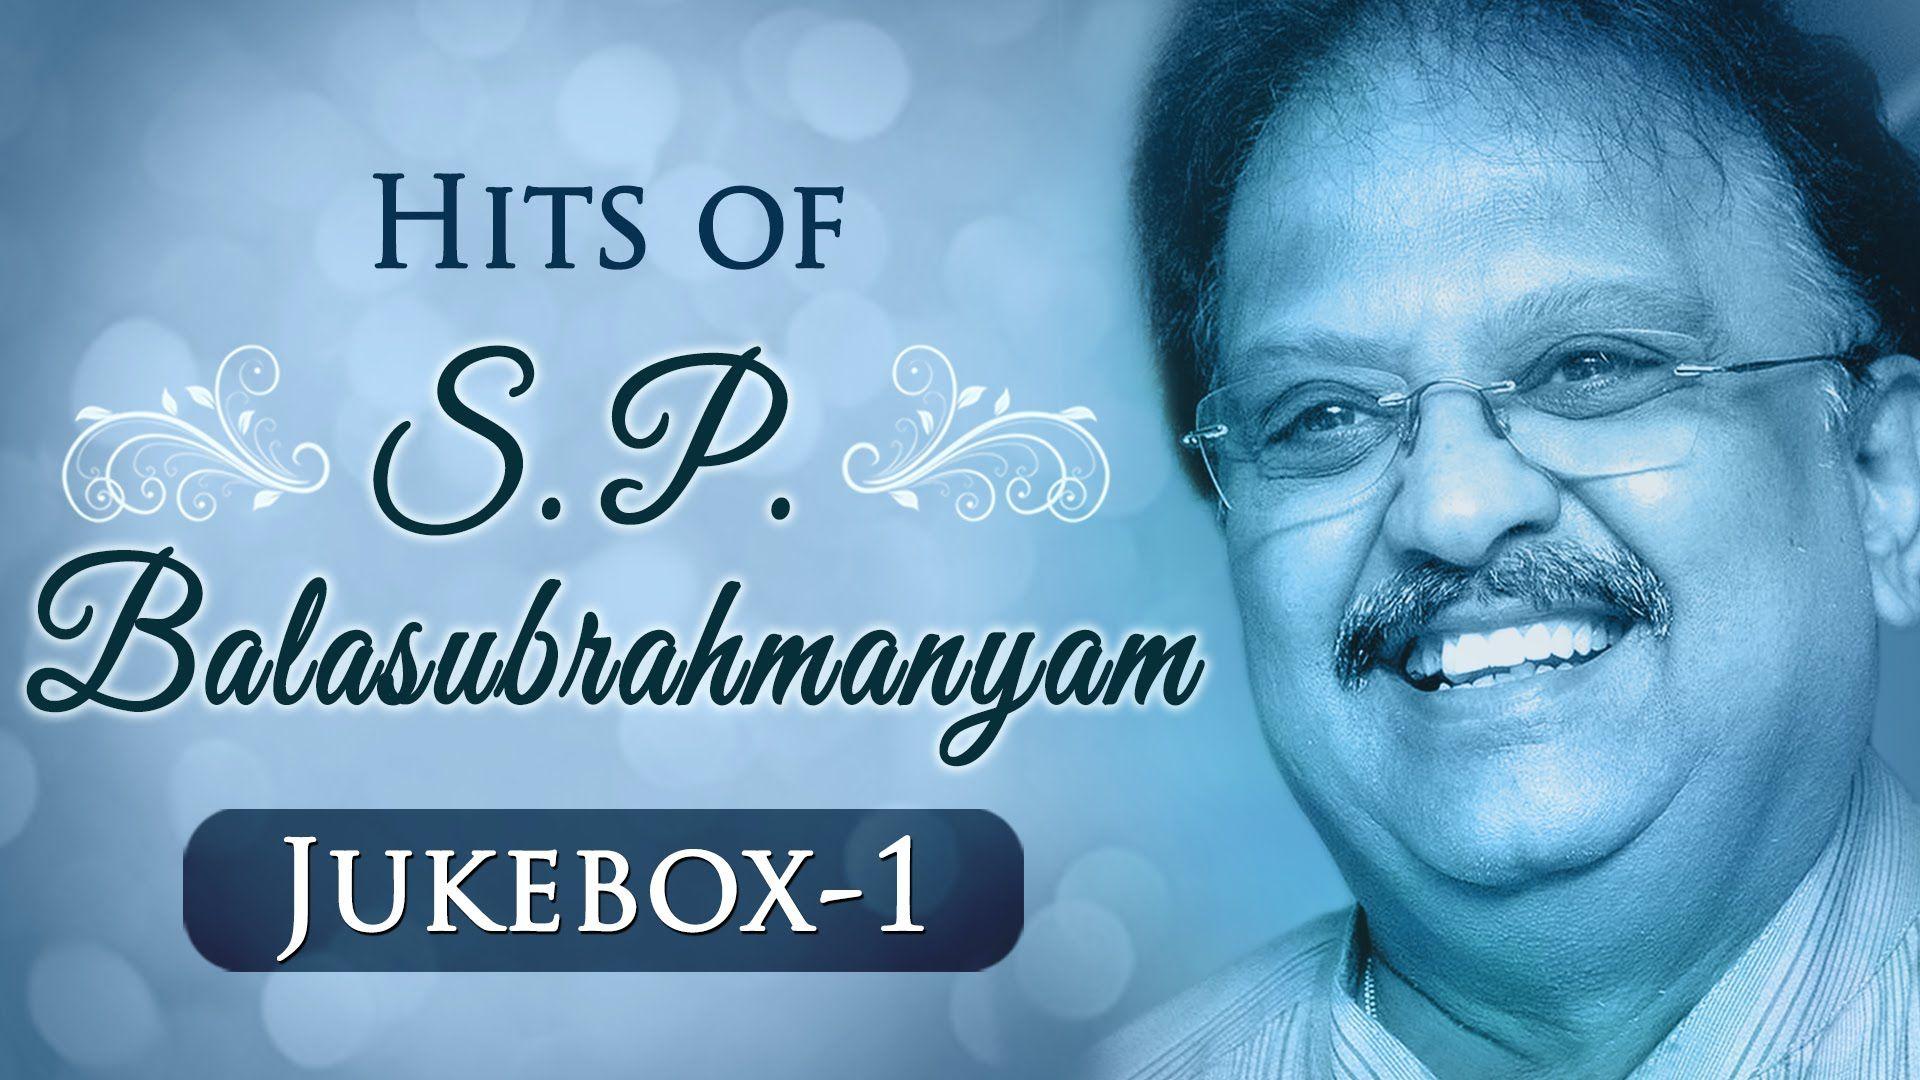 Hits Of S P Balasubrahmanyam Hd Jukebox 1 Evergreen Hindi Songs Songs Mp3 Song Download Jukebox